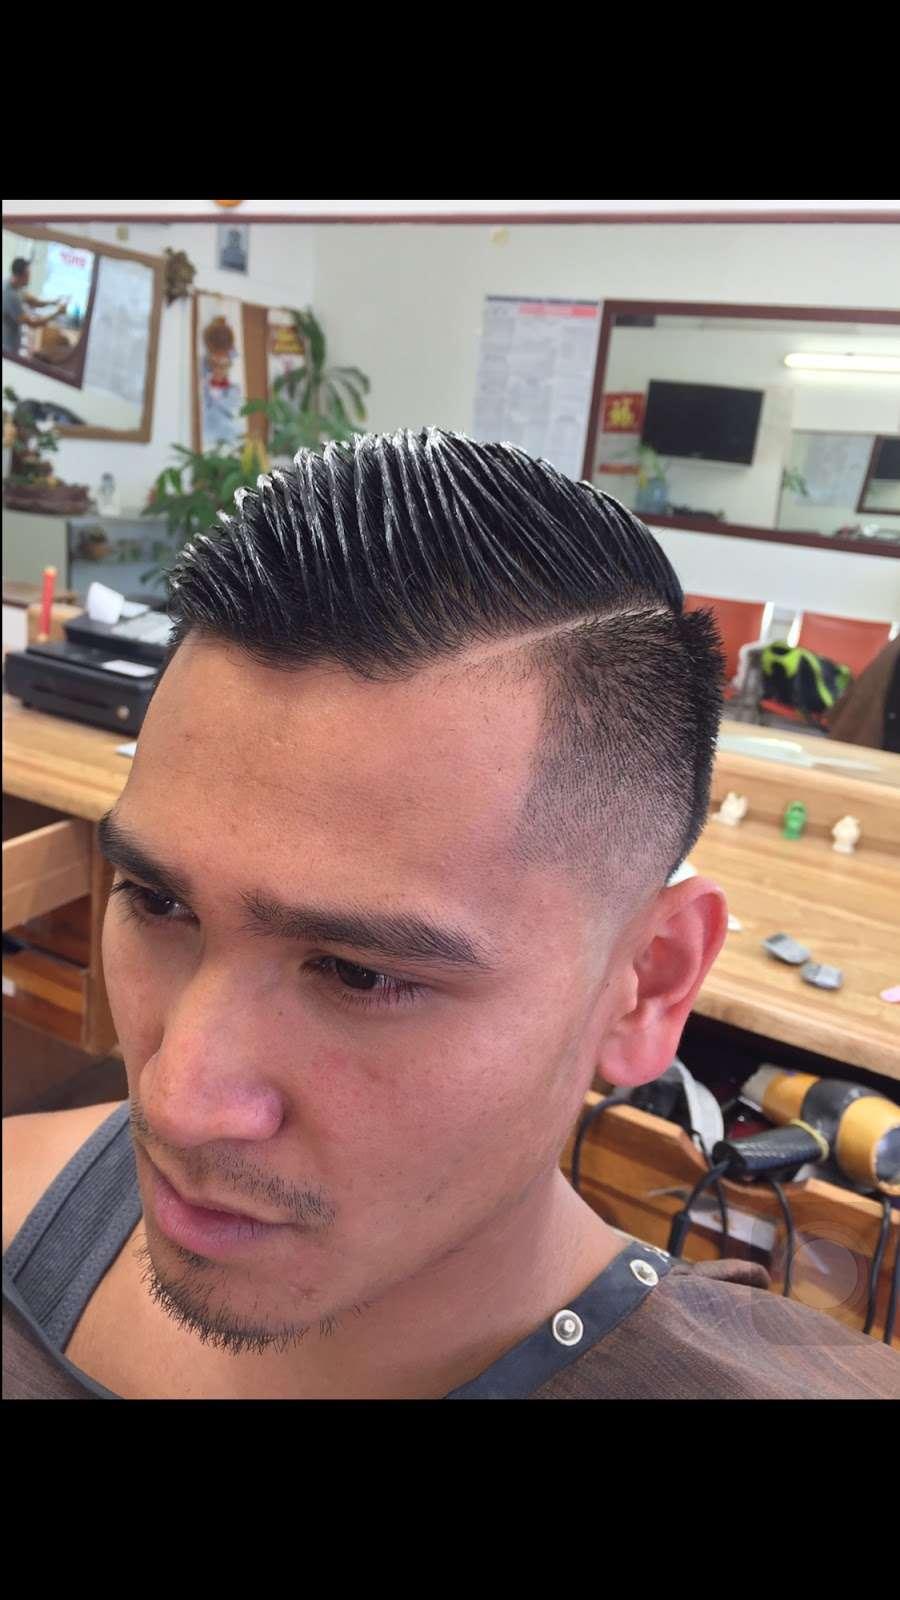 La Mesa Barber Shop - hair care  | Photo 6 of 10 | Address: 8515 La Mesa Blvd, La Mesa, CA 91942, USA | Phone: (619) 908-9557